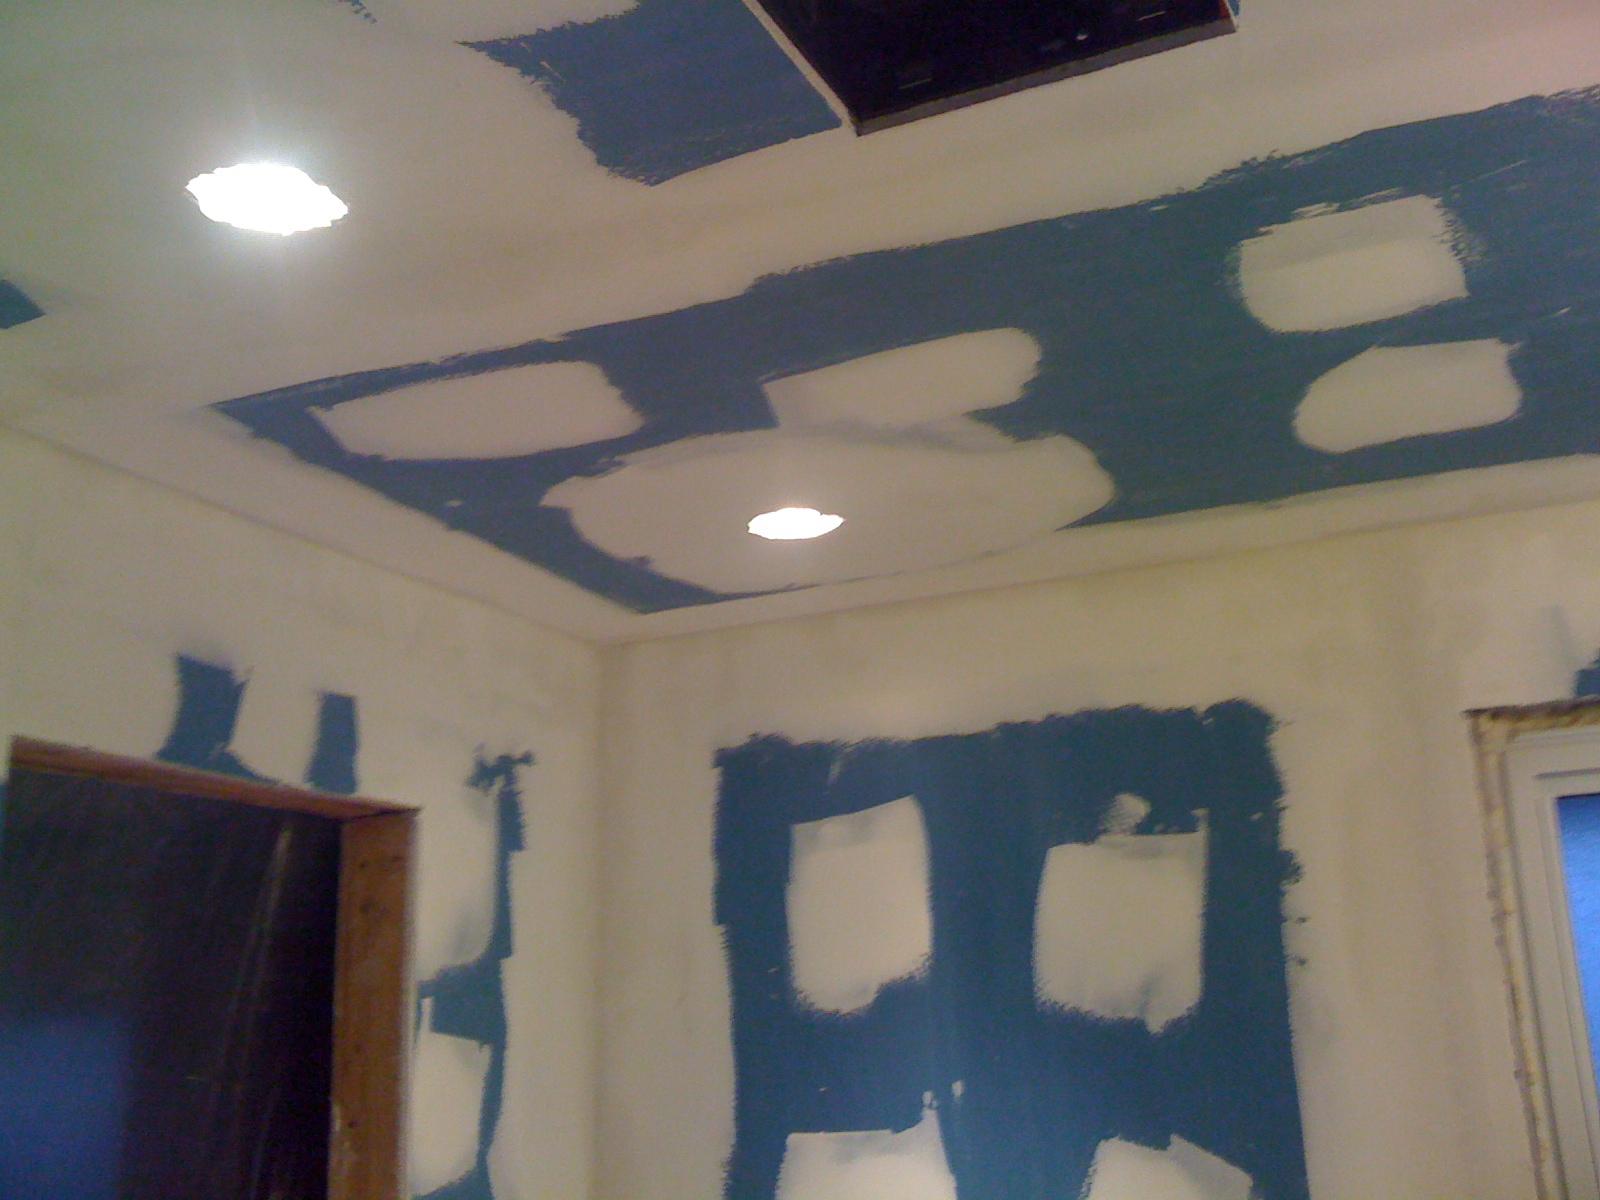 Drywall & Plastering